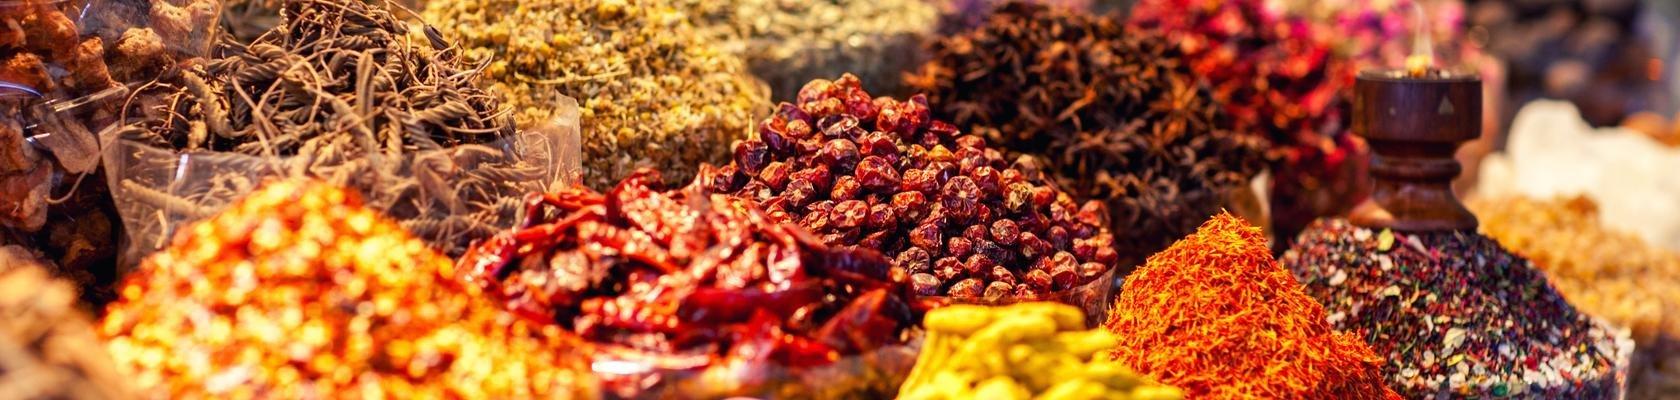 Specerijensoek Dubai